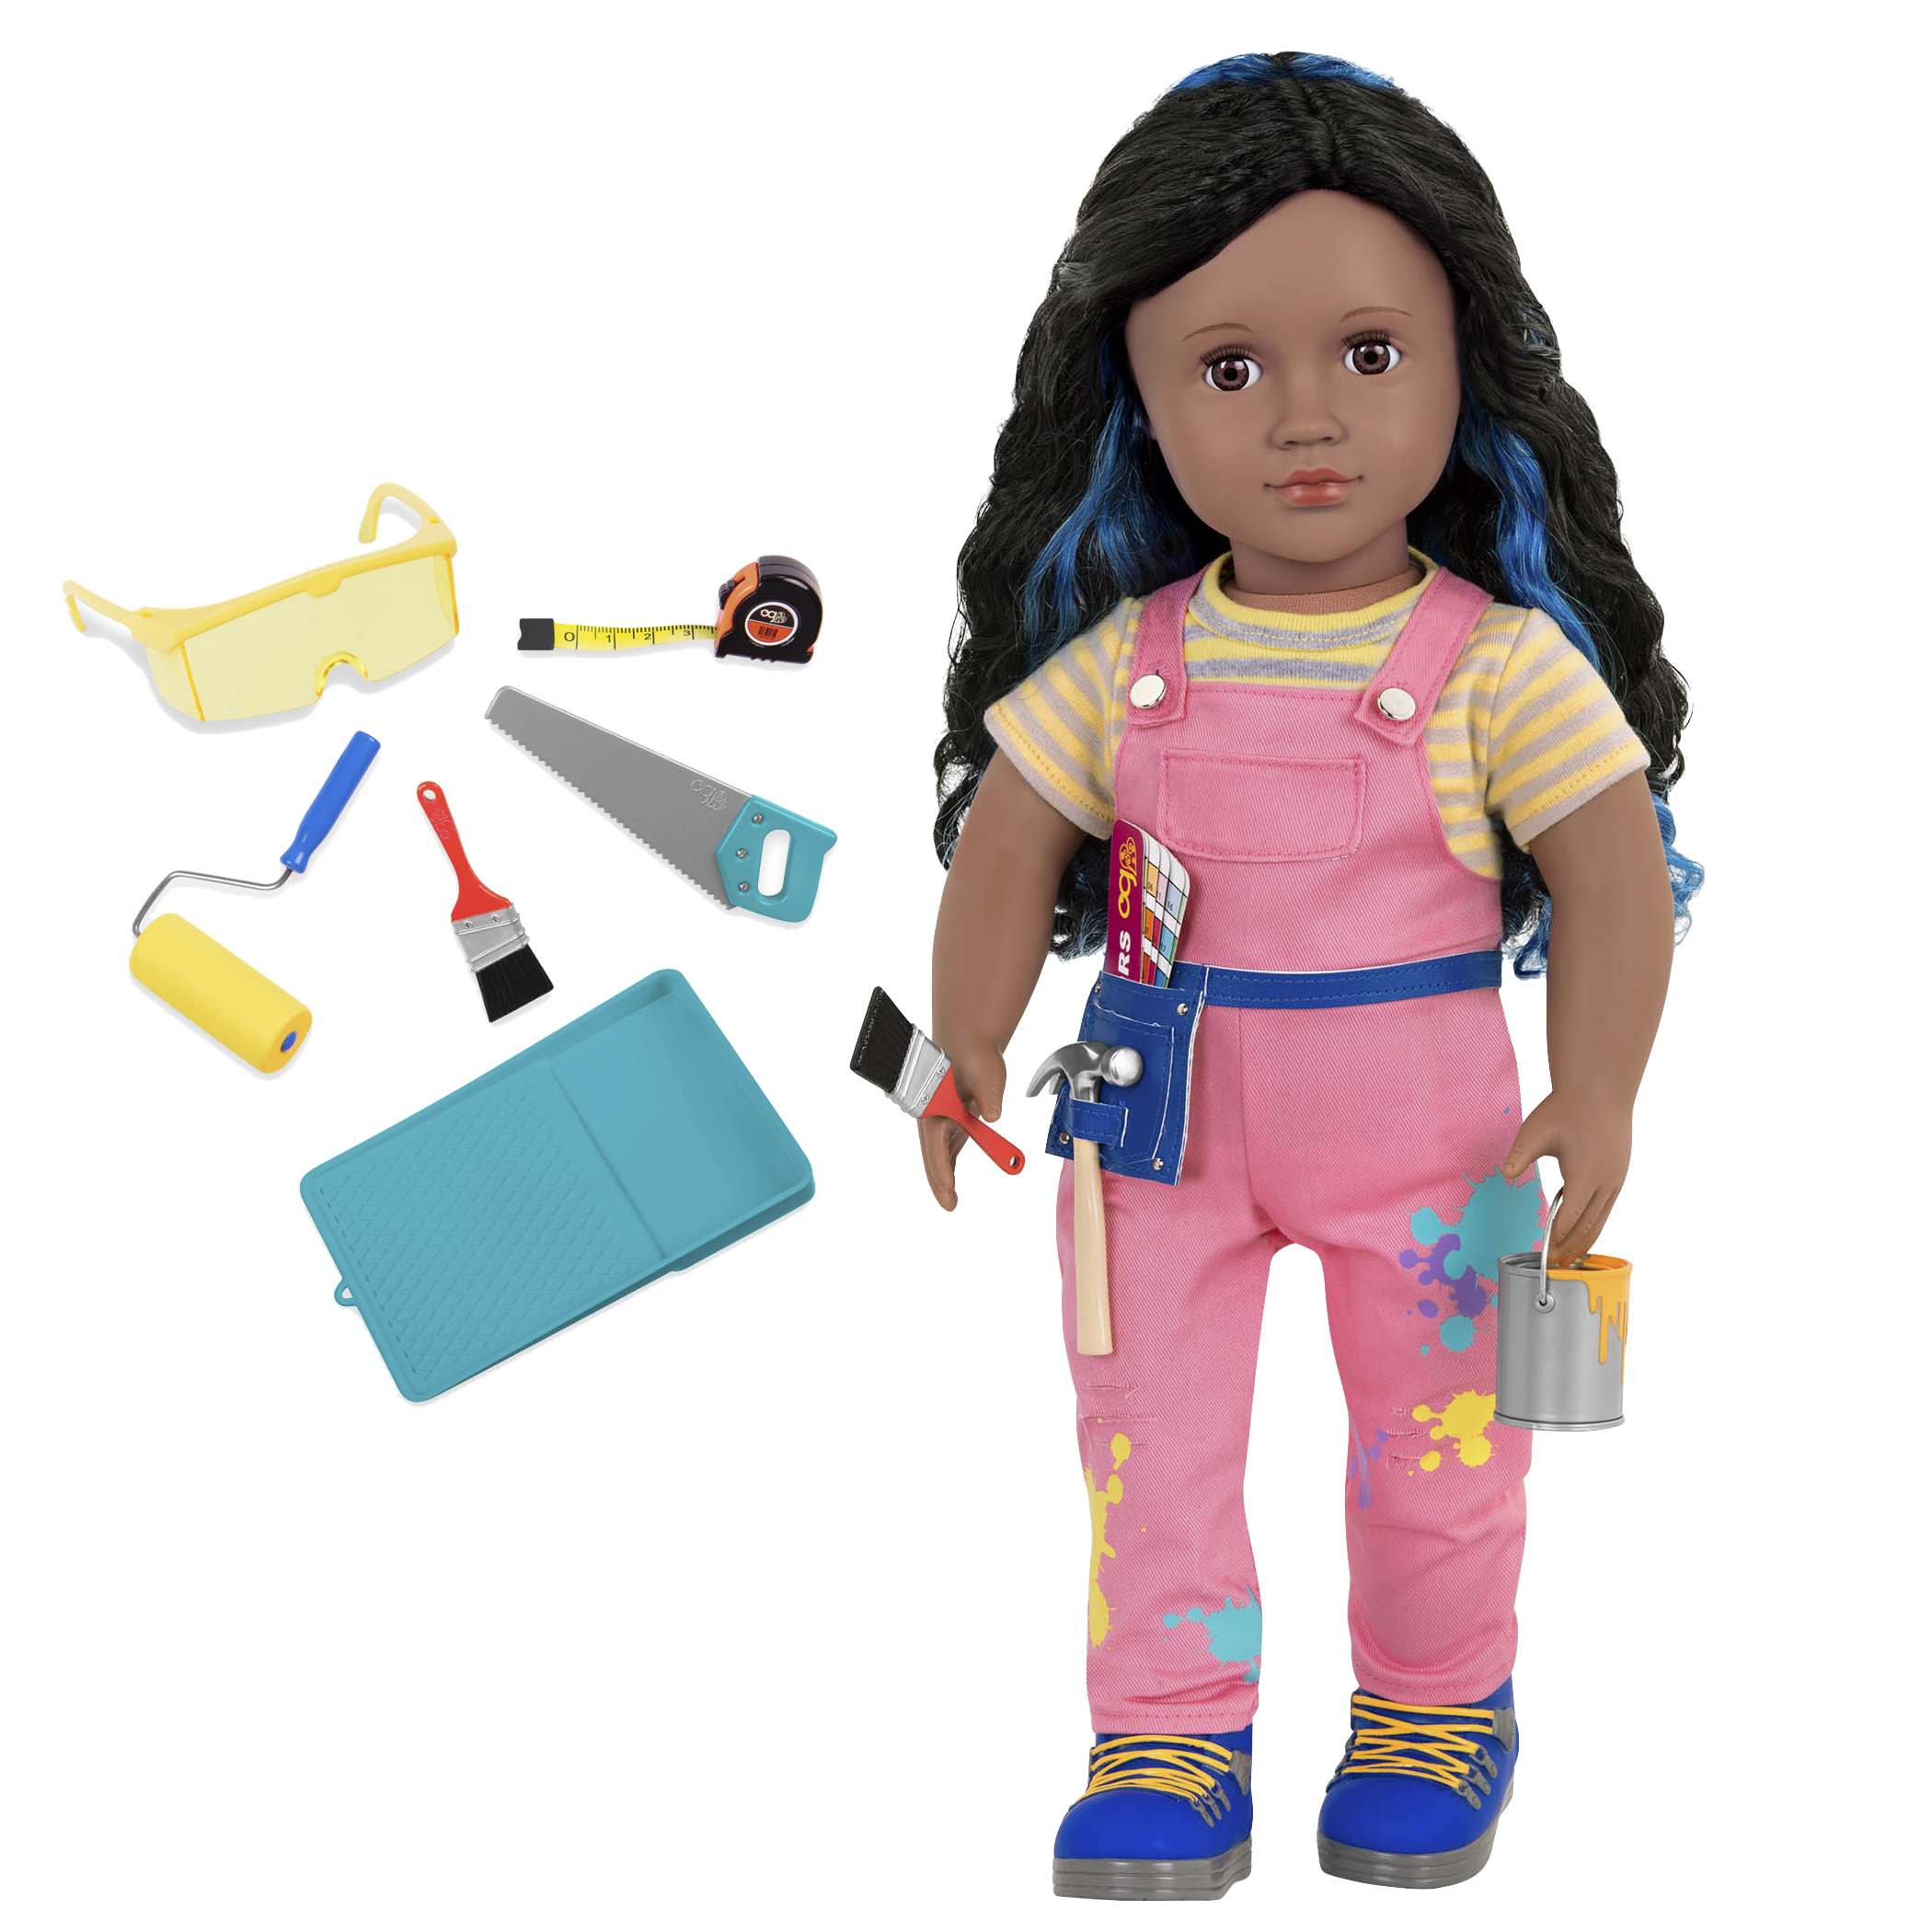 Valeria 18-inch Woodworking Doll